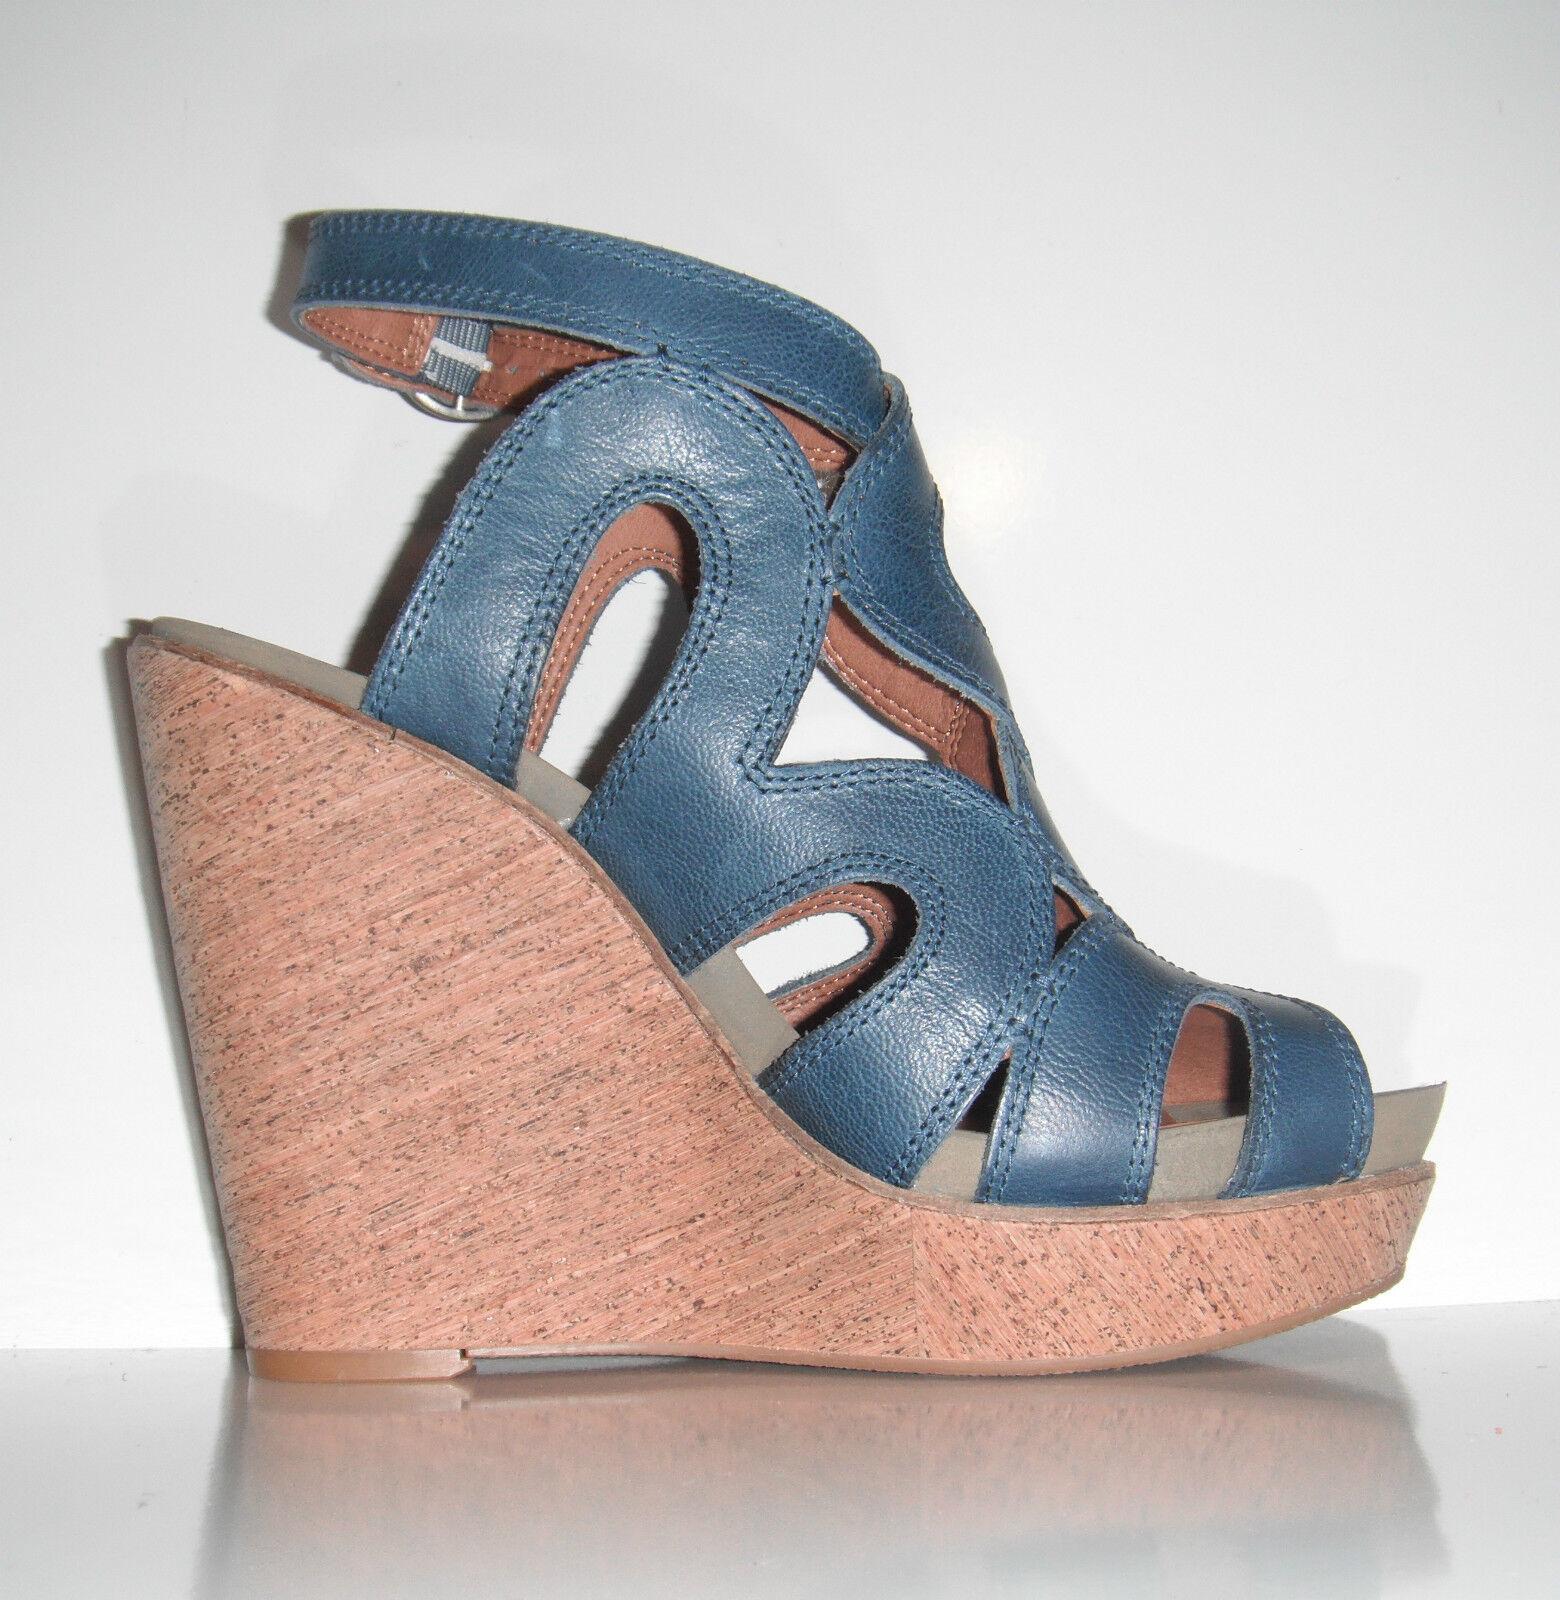 109 NIB Lucky Brand Penrose Stellar bleu Leather Platform Sandal chaussures sz 9.5M